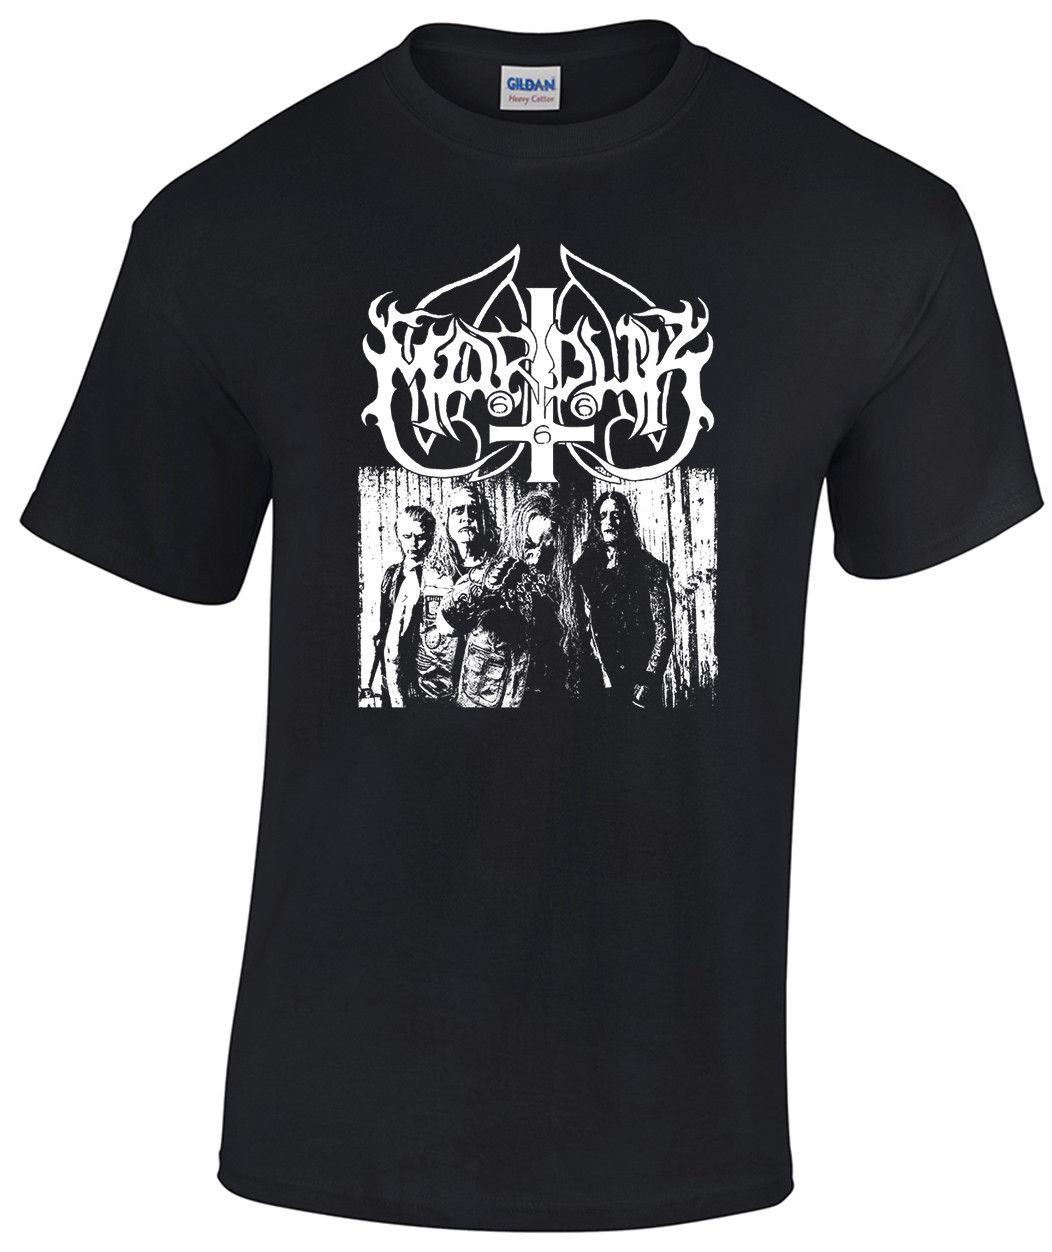 MARDUK camiseta 1349 neblina funeraria oscura Watain Tsjuder Impaled Nazarene nueva moda camiseta estampado de letras Top Tee